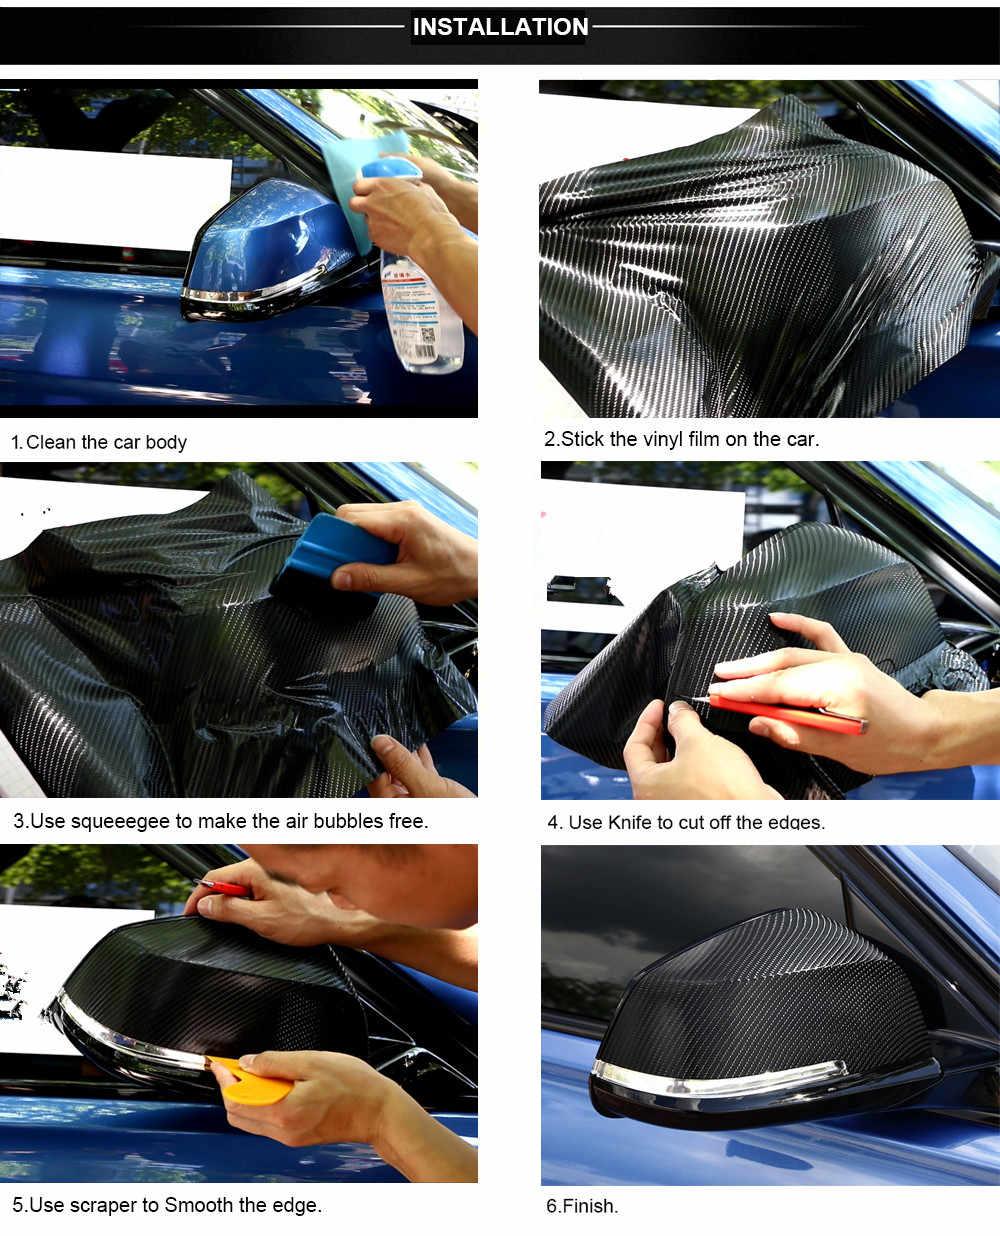 30x127 سنتيمتر 3D 5D سيارة الكربون الألياف التفاف لاصق غشائي و صائق ل BMW 335is سكوتر غران 760Li 320d 135i E60 E36 F30 F30